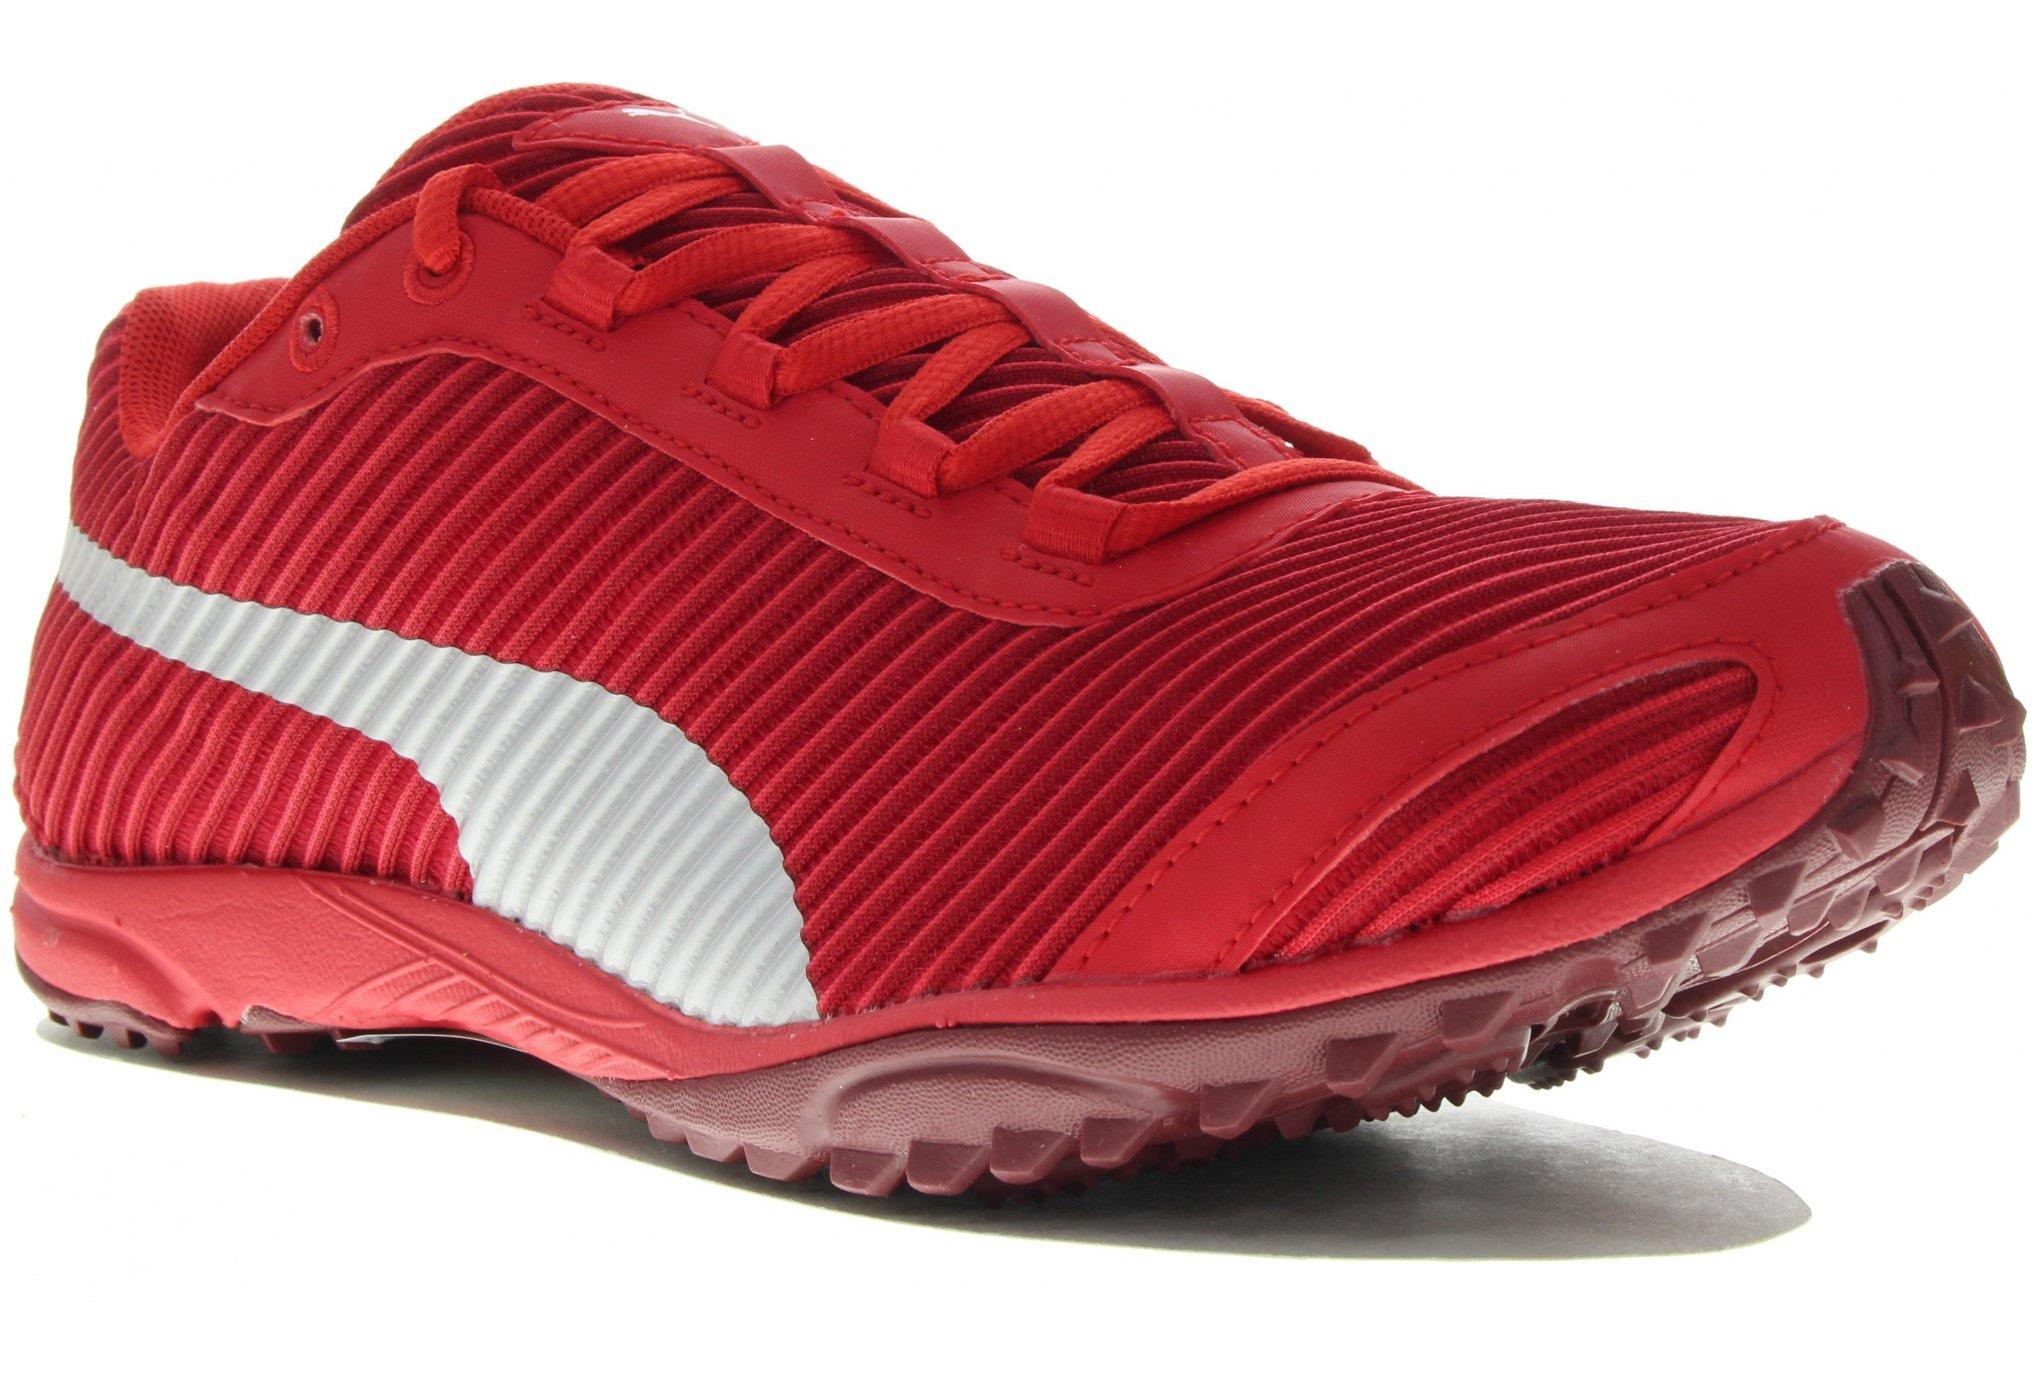 Puma EvoSpeed Haraka 5 M Diététique Chaussures homme